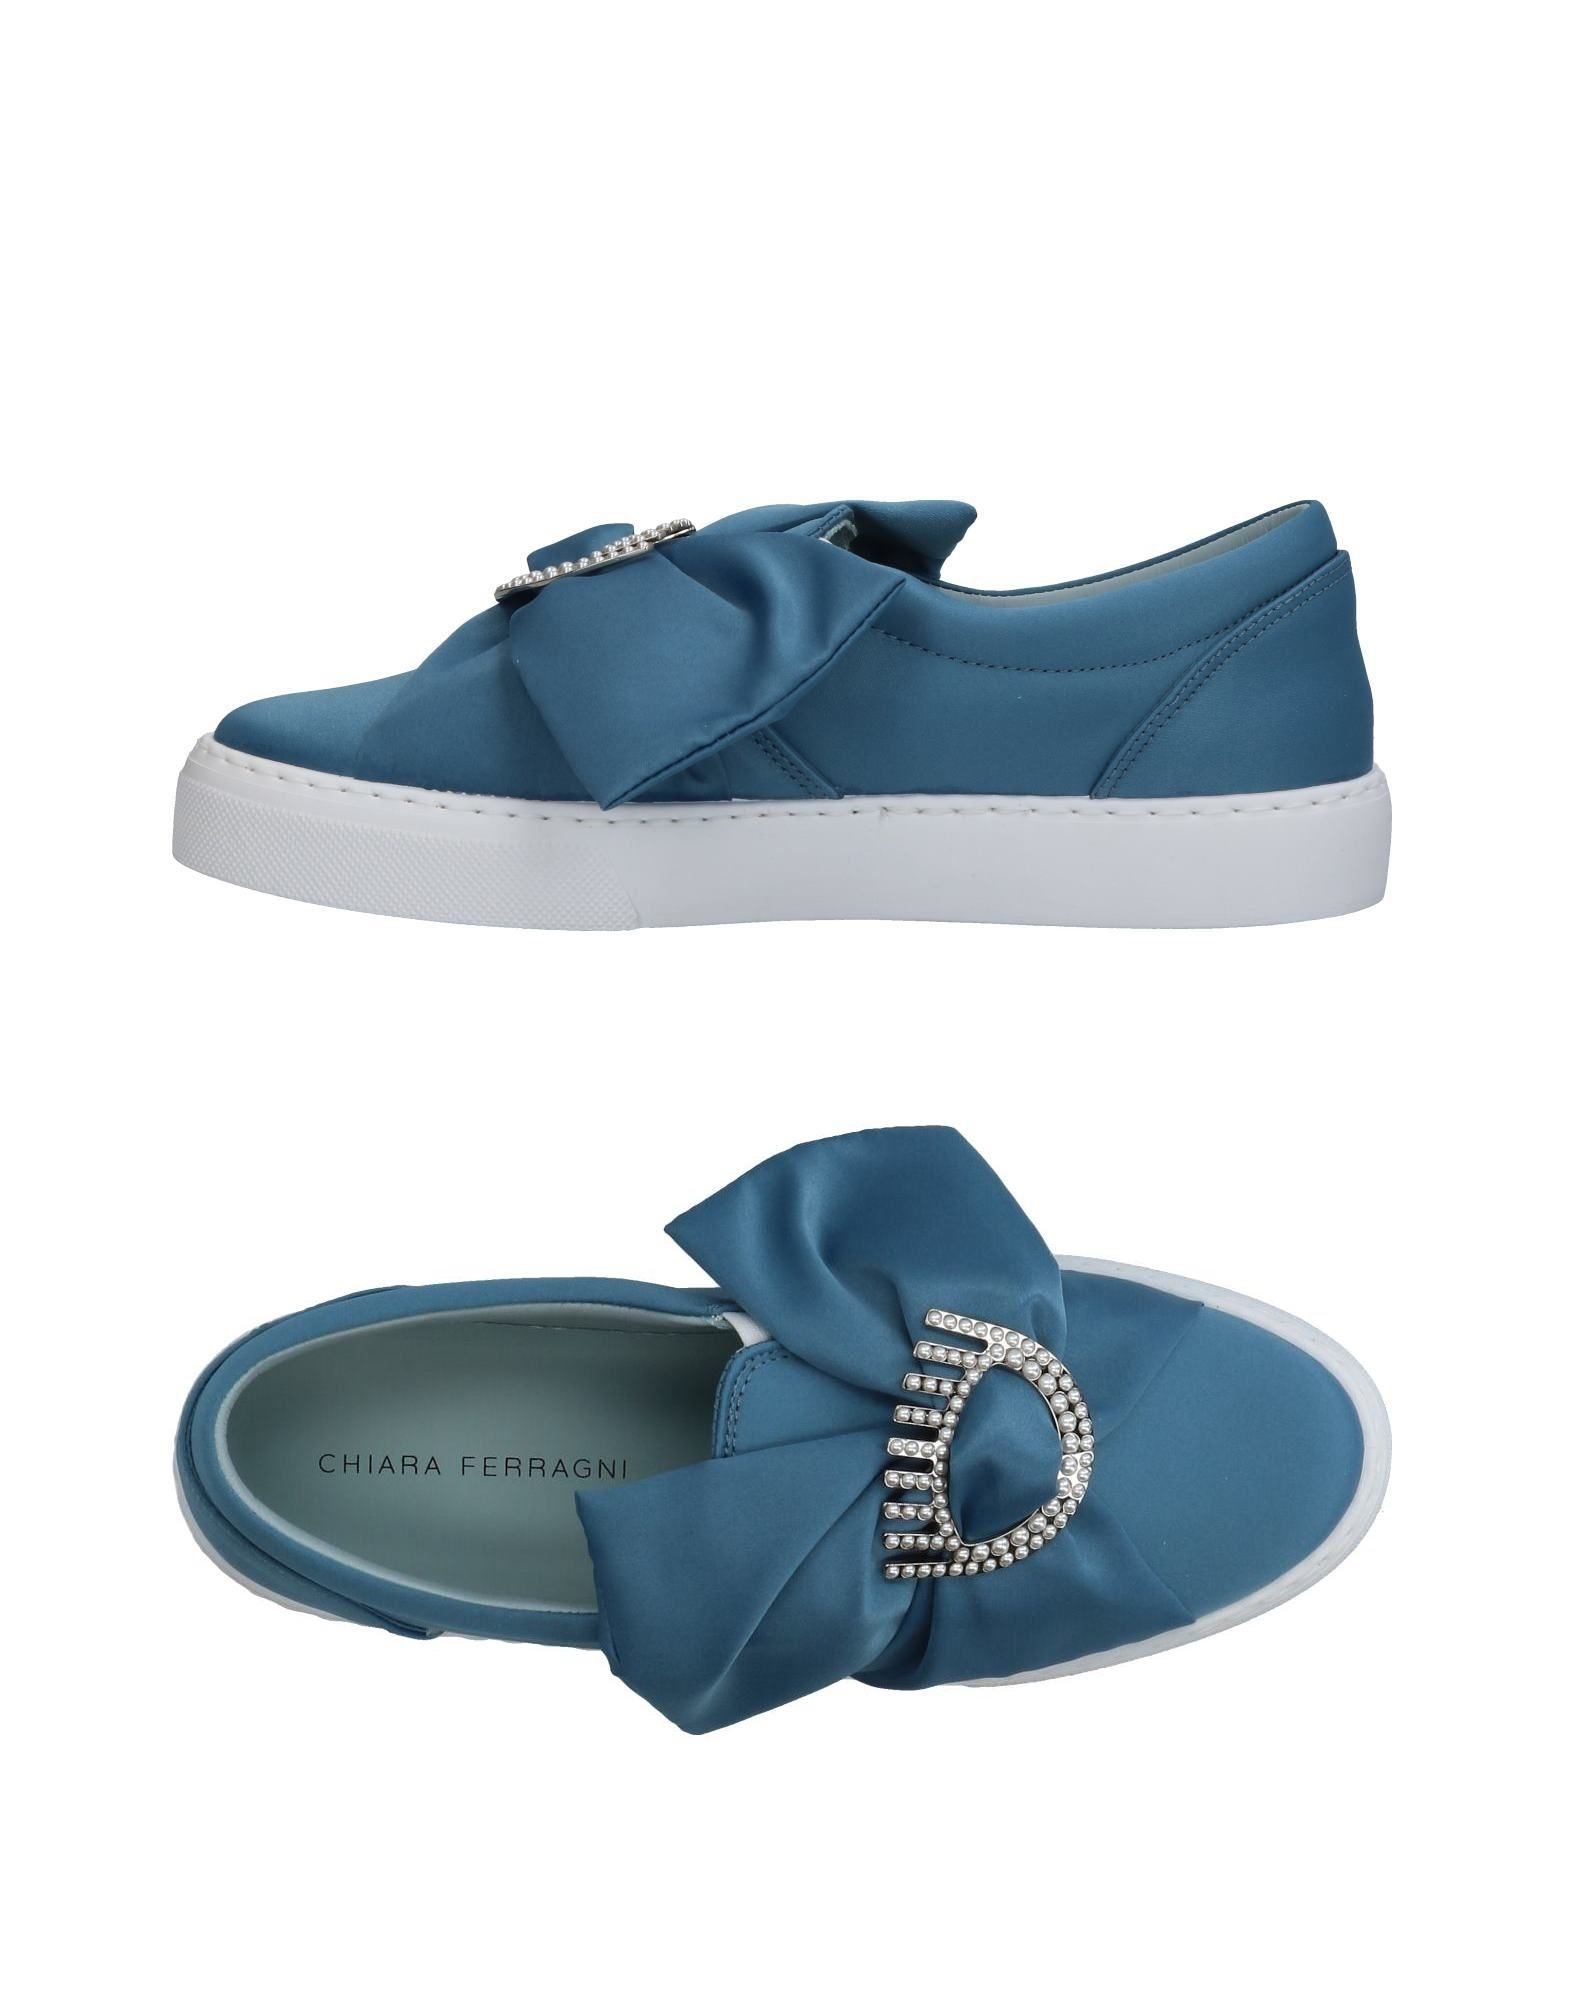 Chiara Ferragni Sneakers Damen  11339338BN Gute Qualität beliebte Schuhe